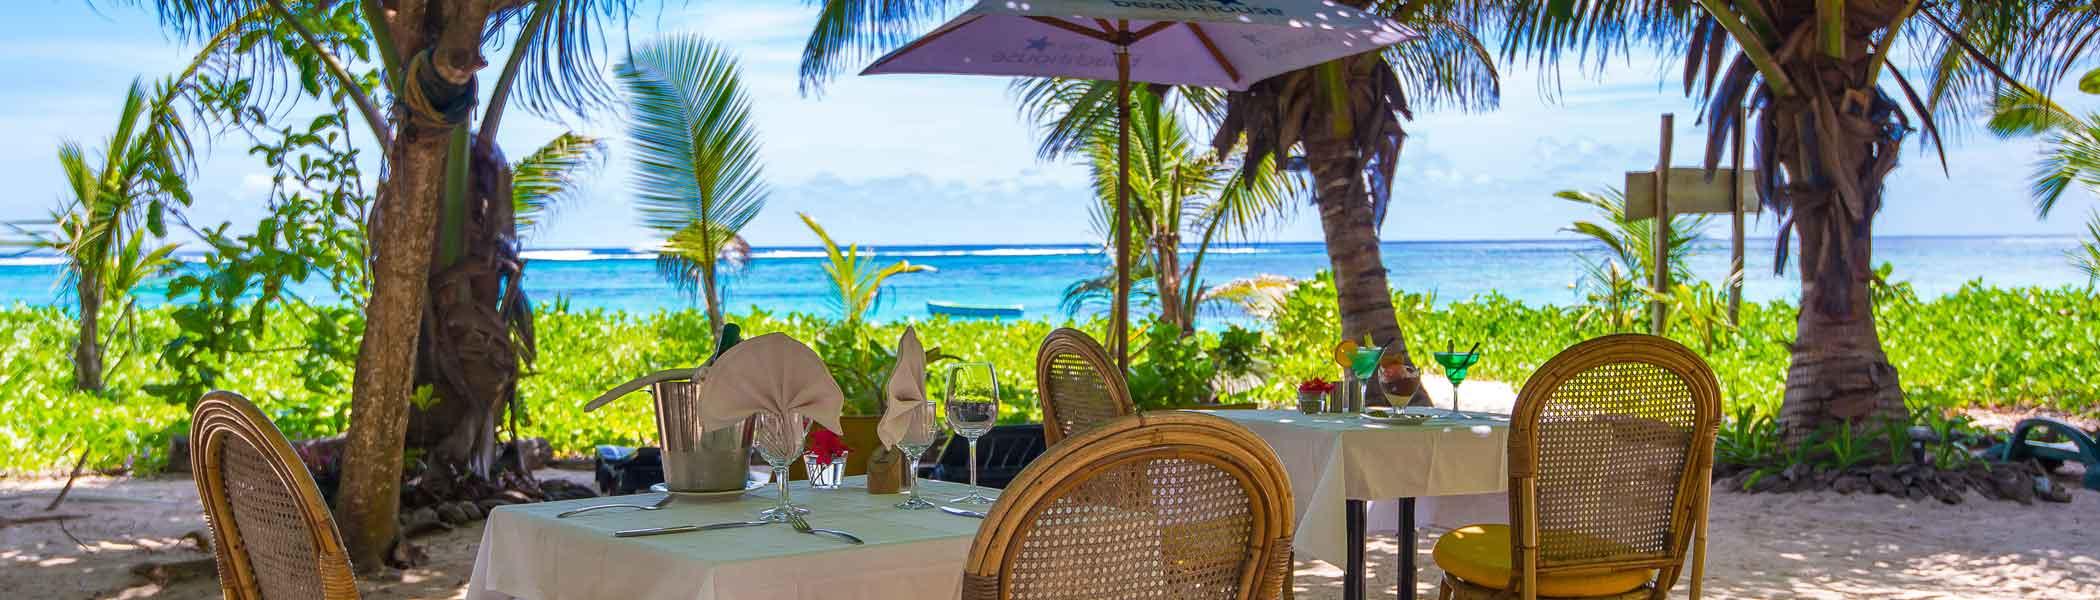 les-dauphins-heureux, Bars and restaurants in Seychelles Islands